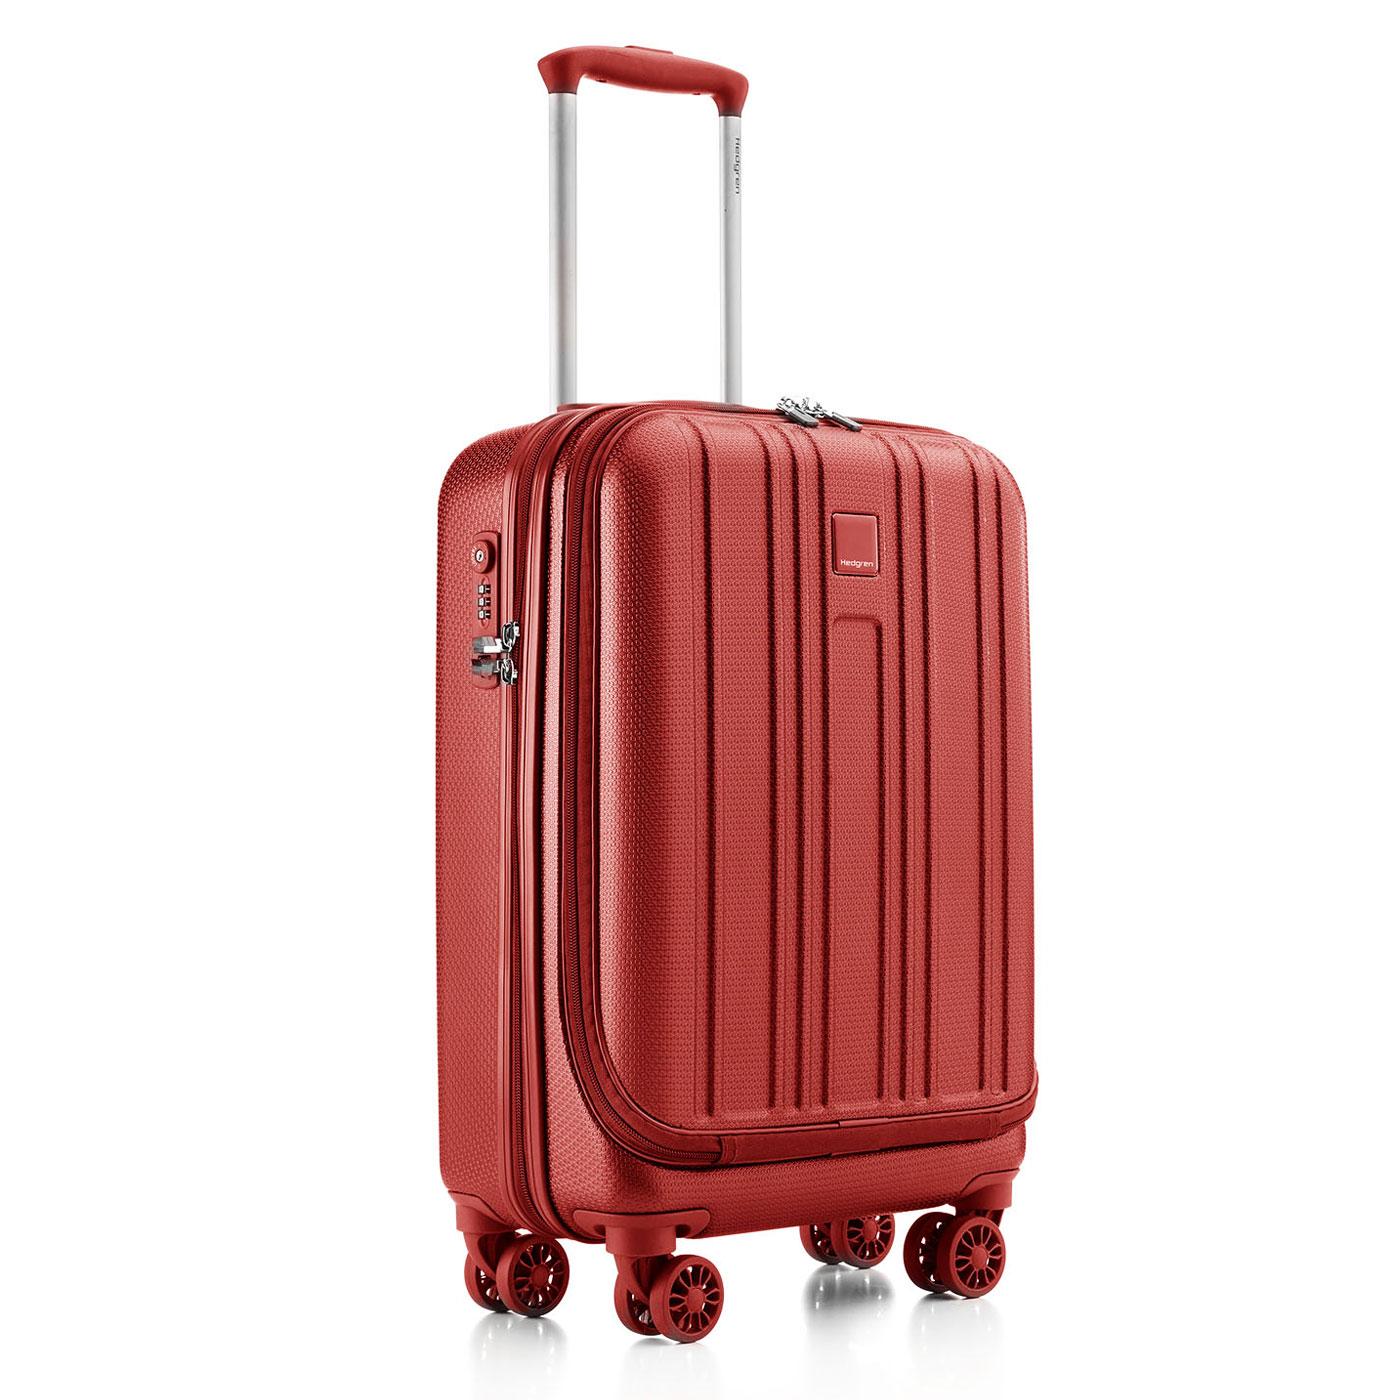 Hedgren transit boarding s rouge sac sacoche housse for Valise makita avec tous ses accessoires